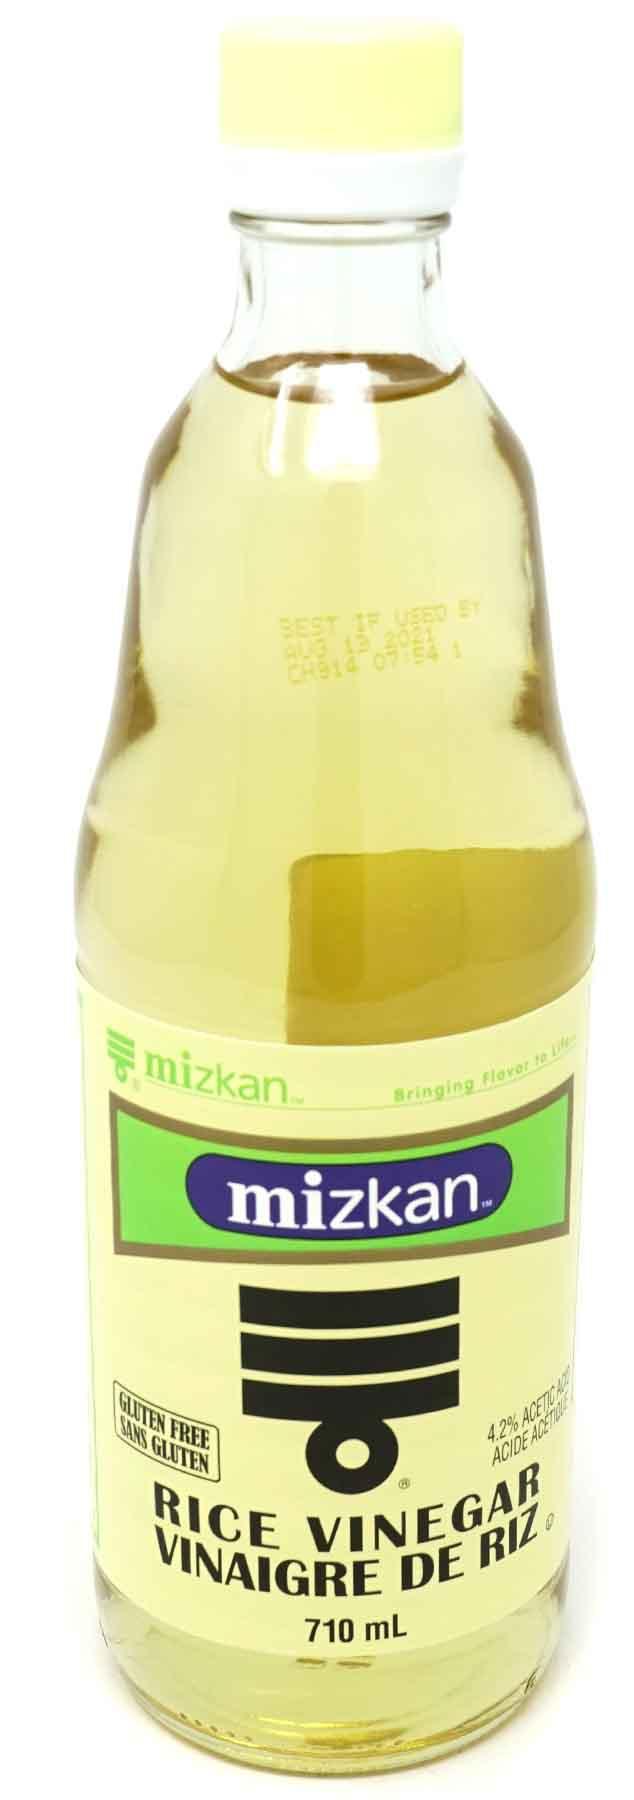 Mizkan Reisessig, 710 ml